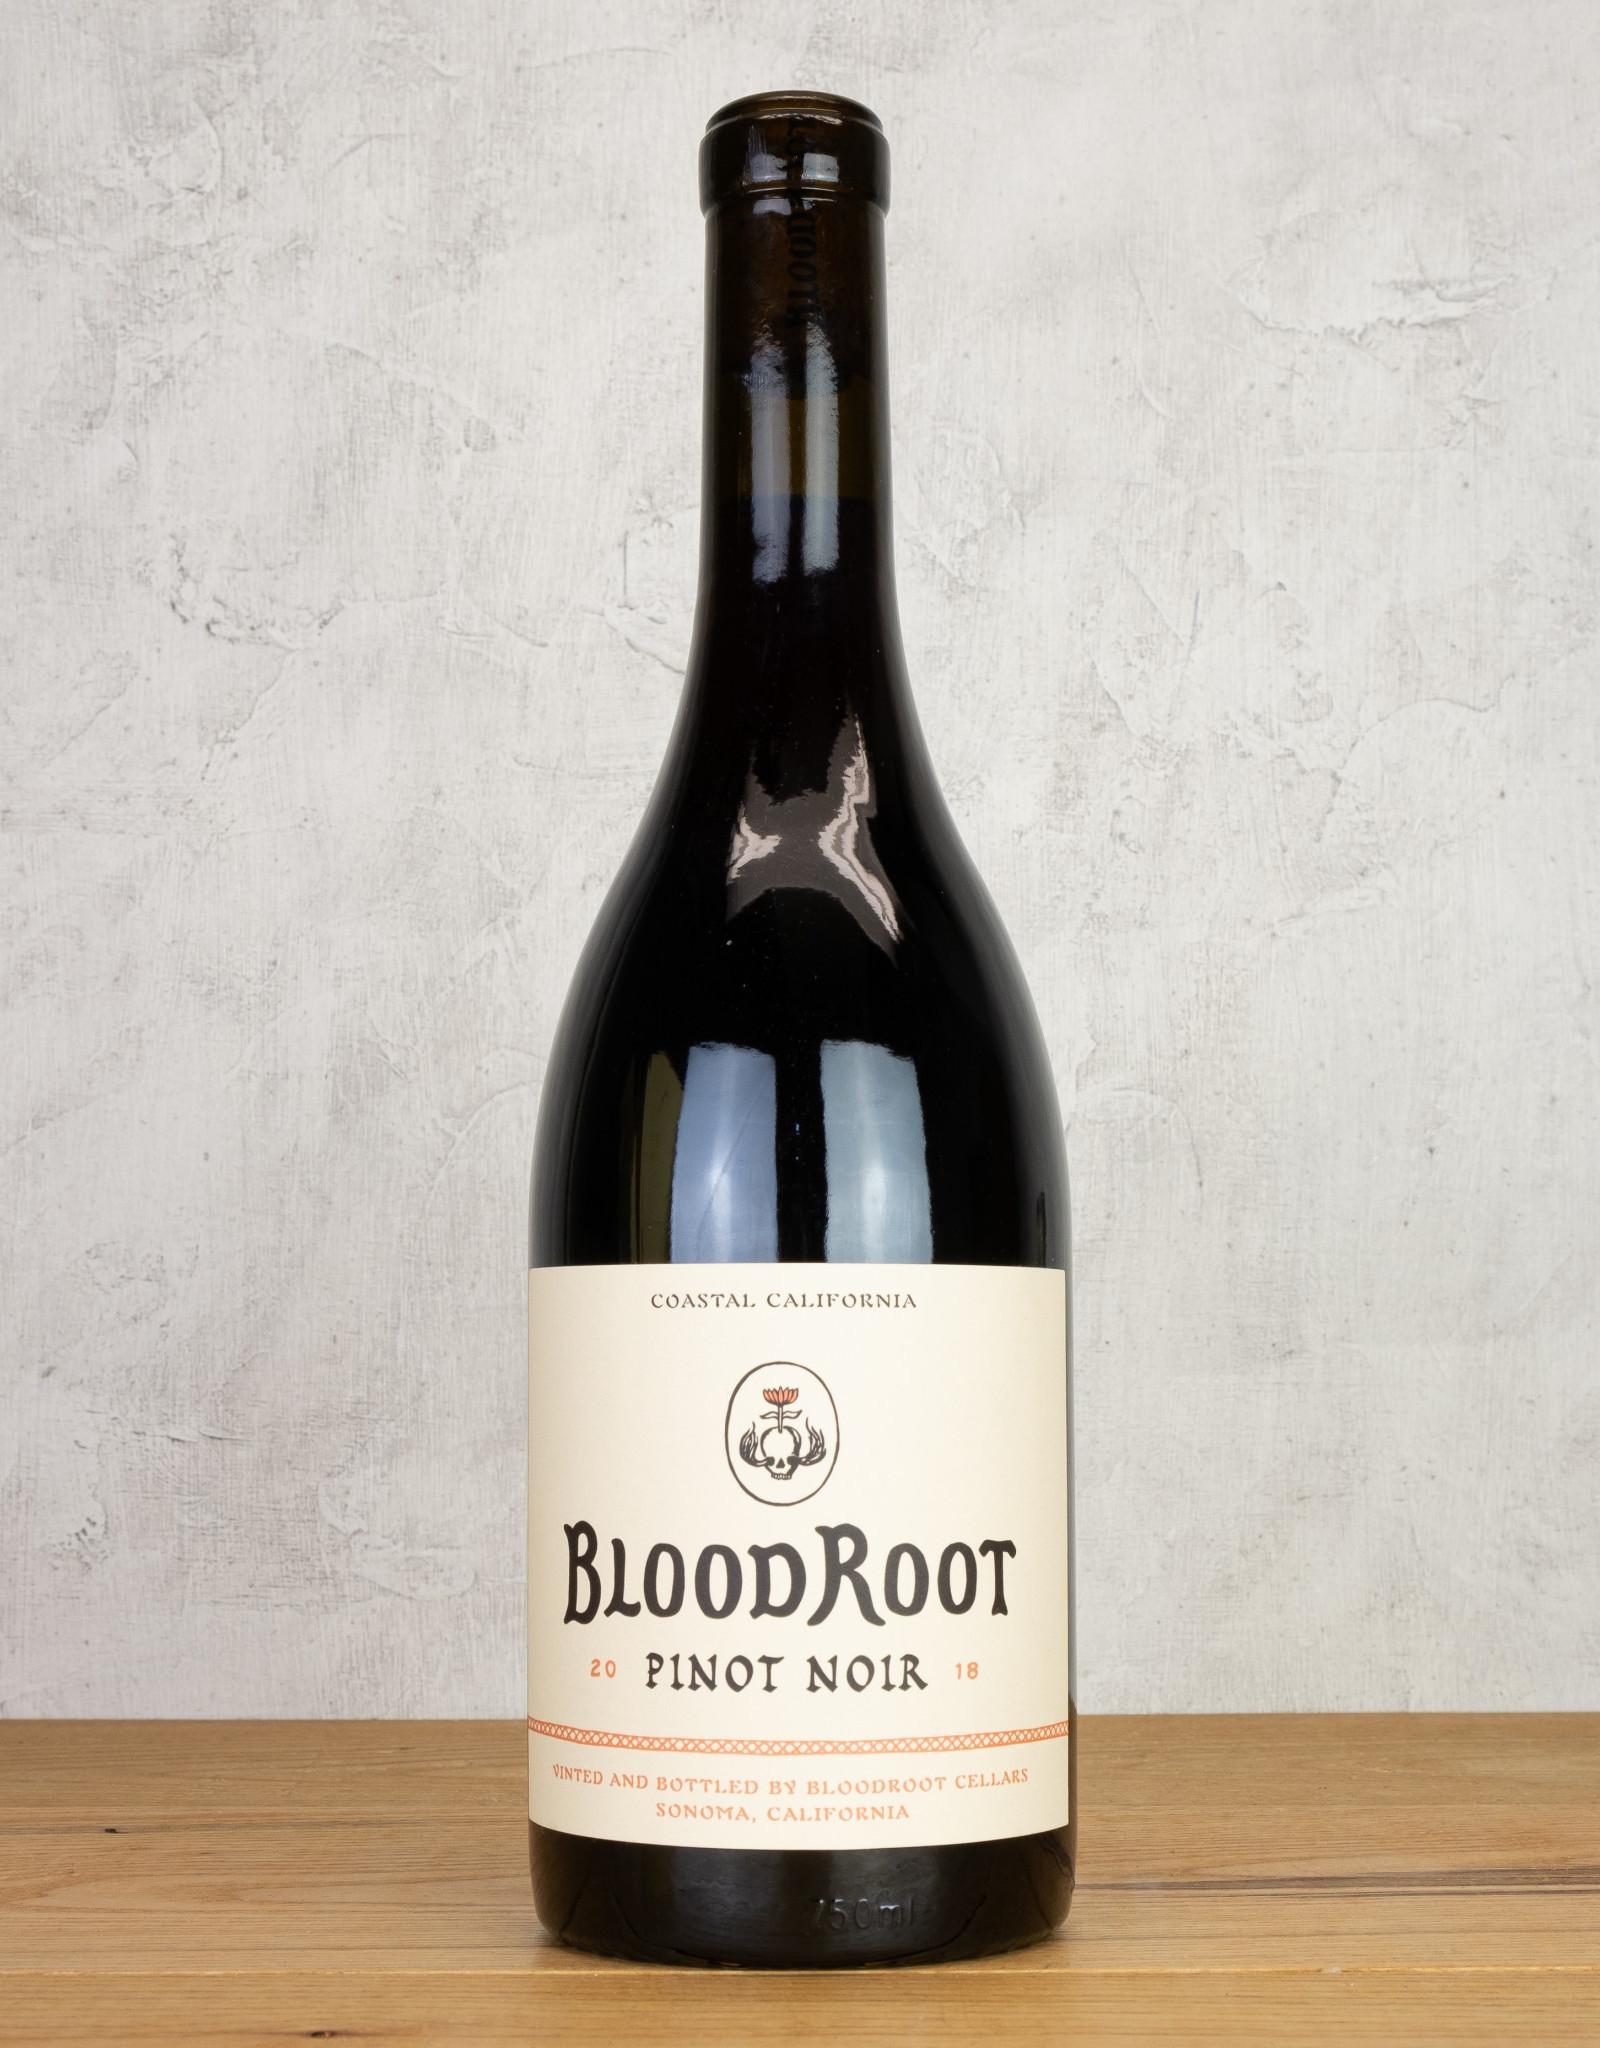 BloodRoot Pinot Noir